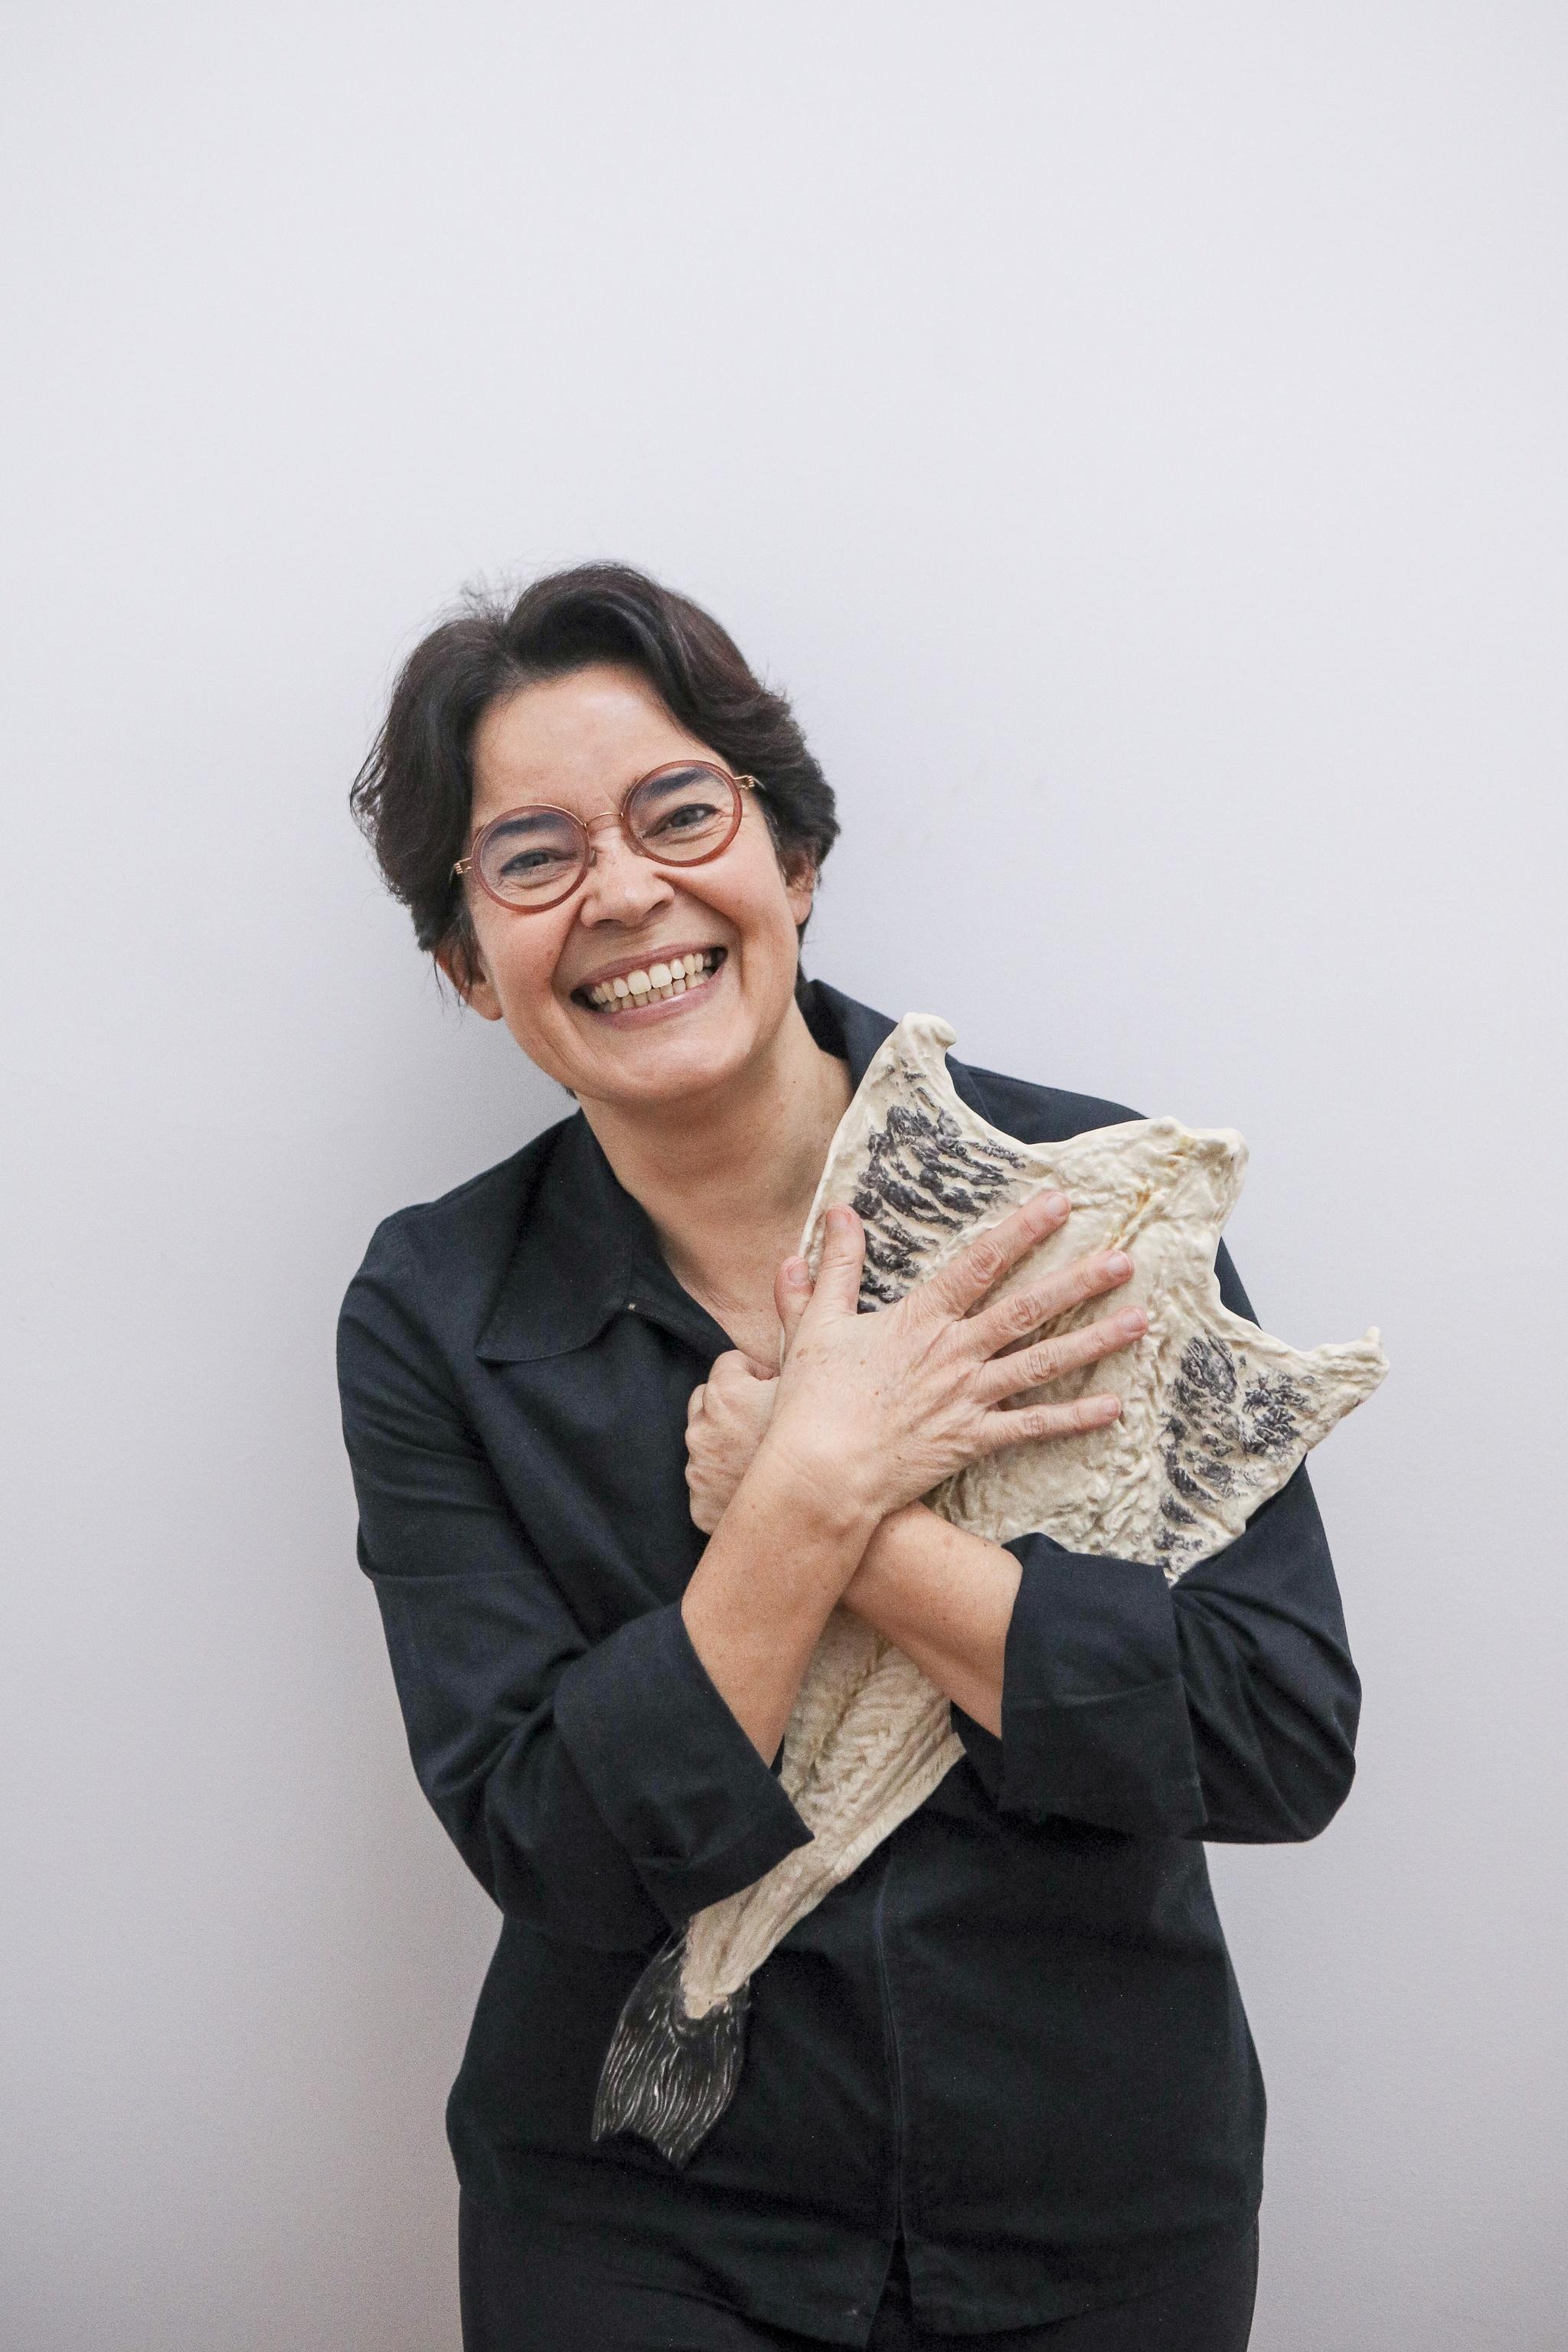 Alexandra Prado Coelho